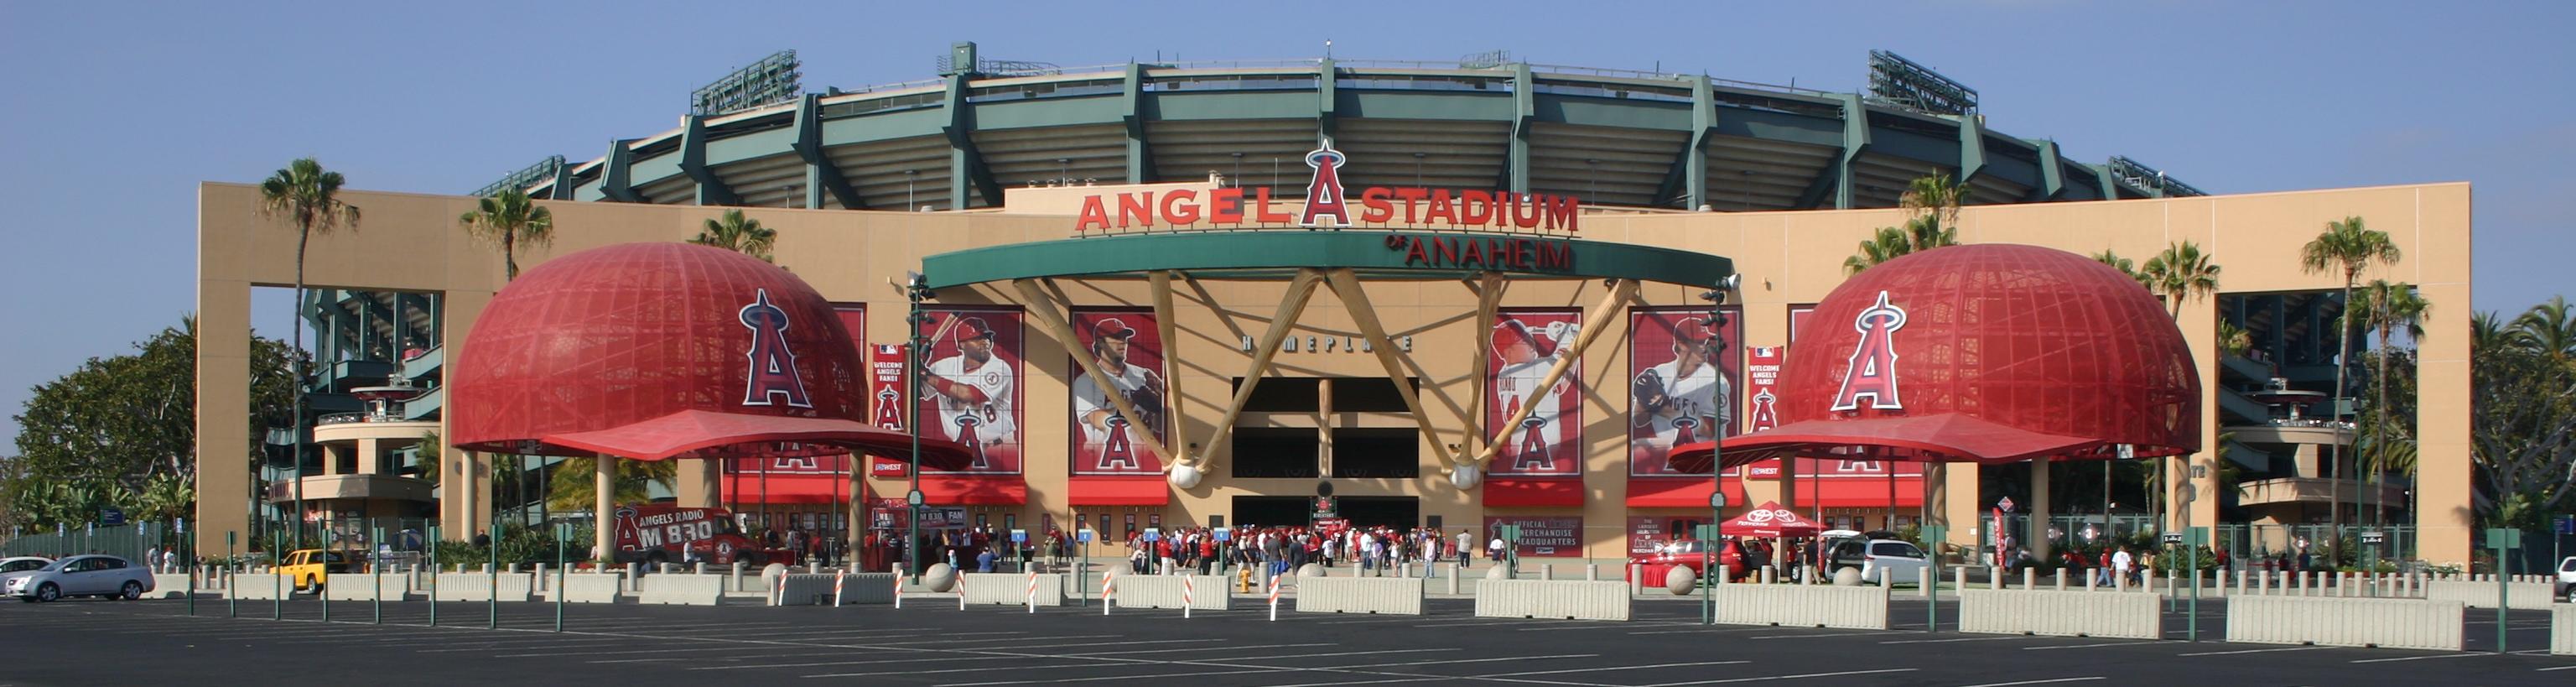 Angel Stadium,Anaheim,Los Angeles,Baseball trips,group tours